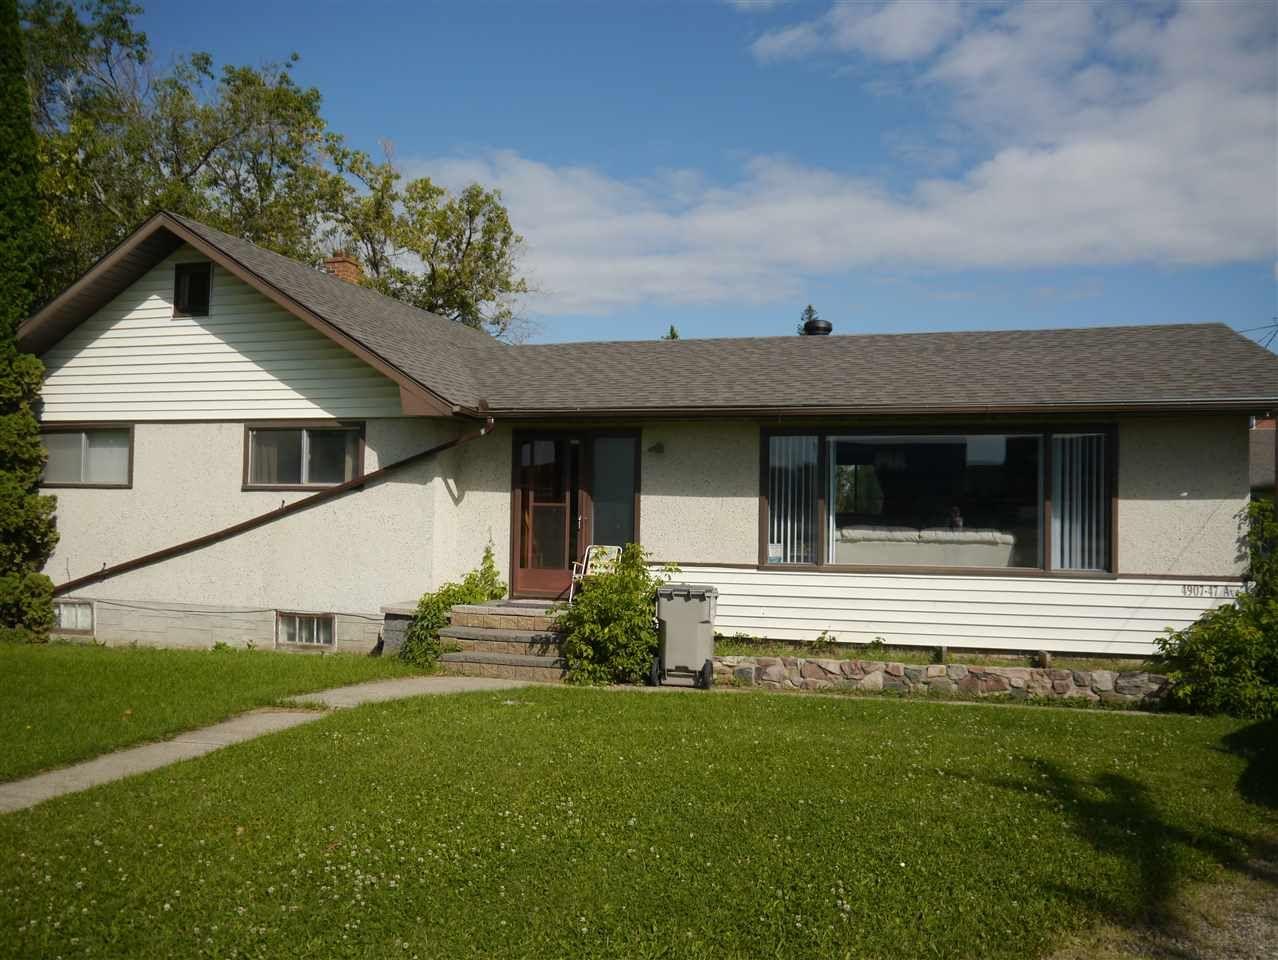 Main Photo: 4907&4911 47th Avenue: Stony Plain House for sale : MLS®# E4186492